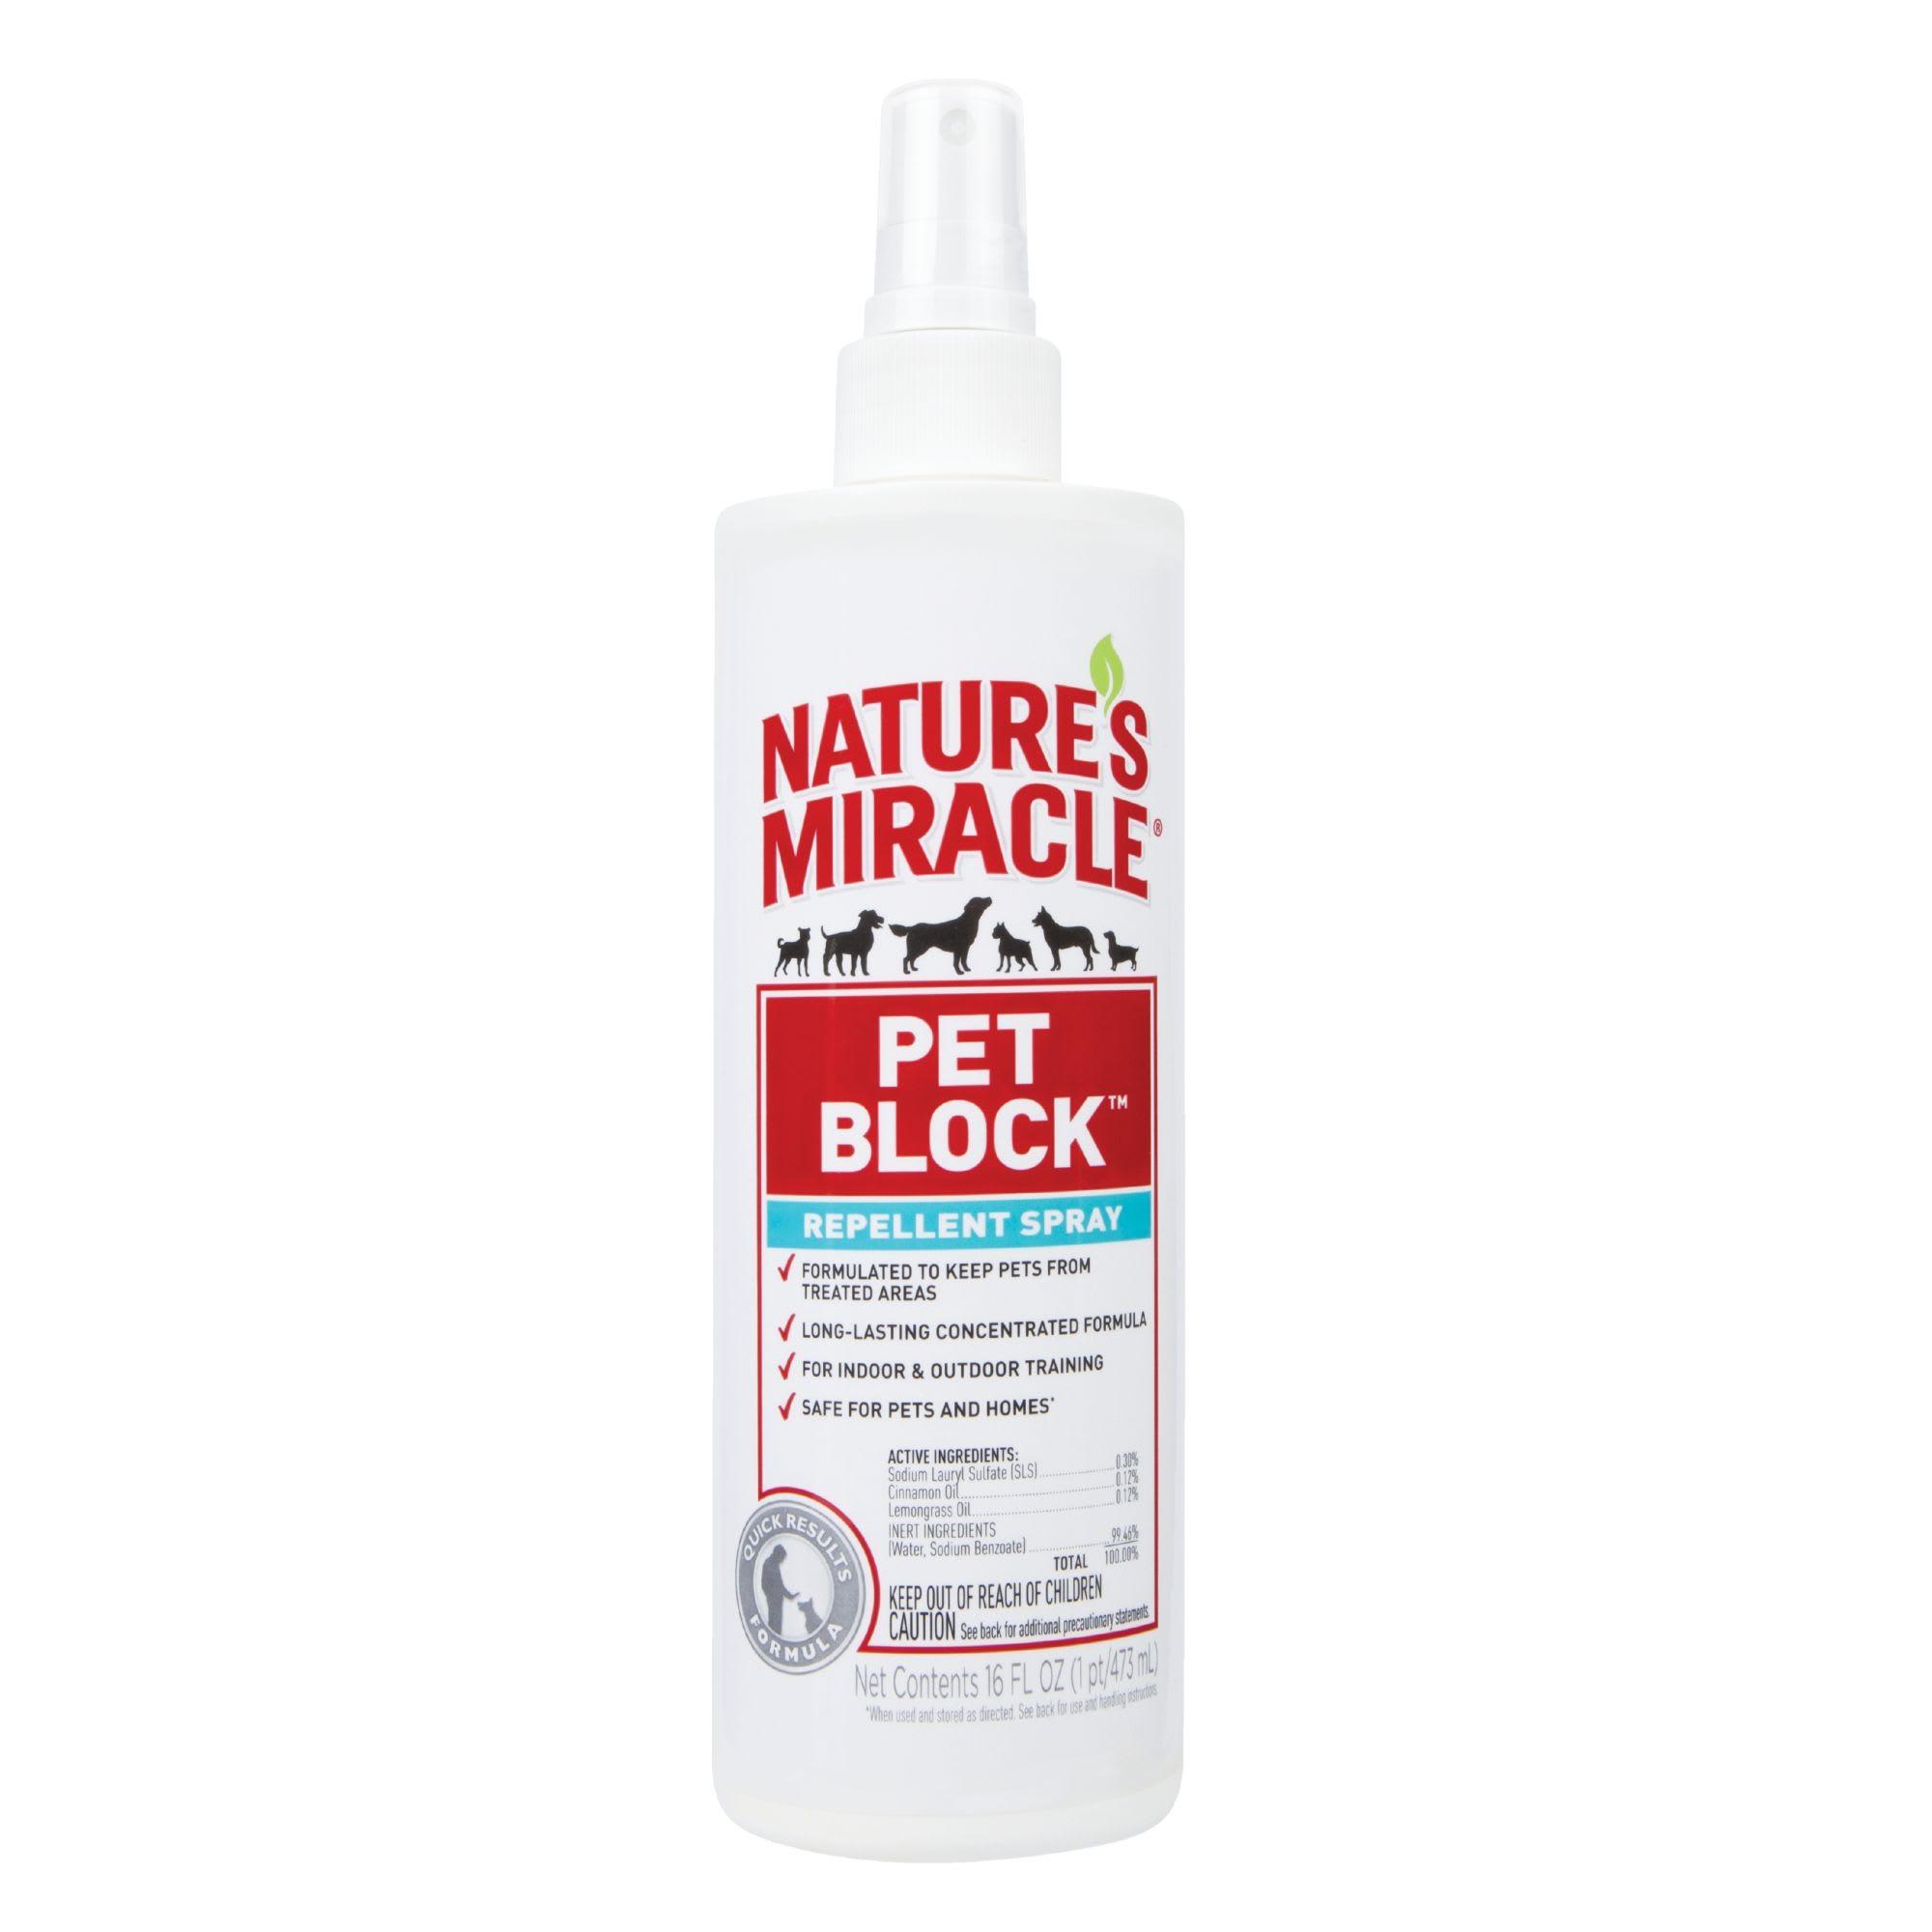 Miracle Pet Block Repellent Spray